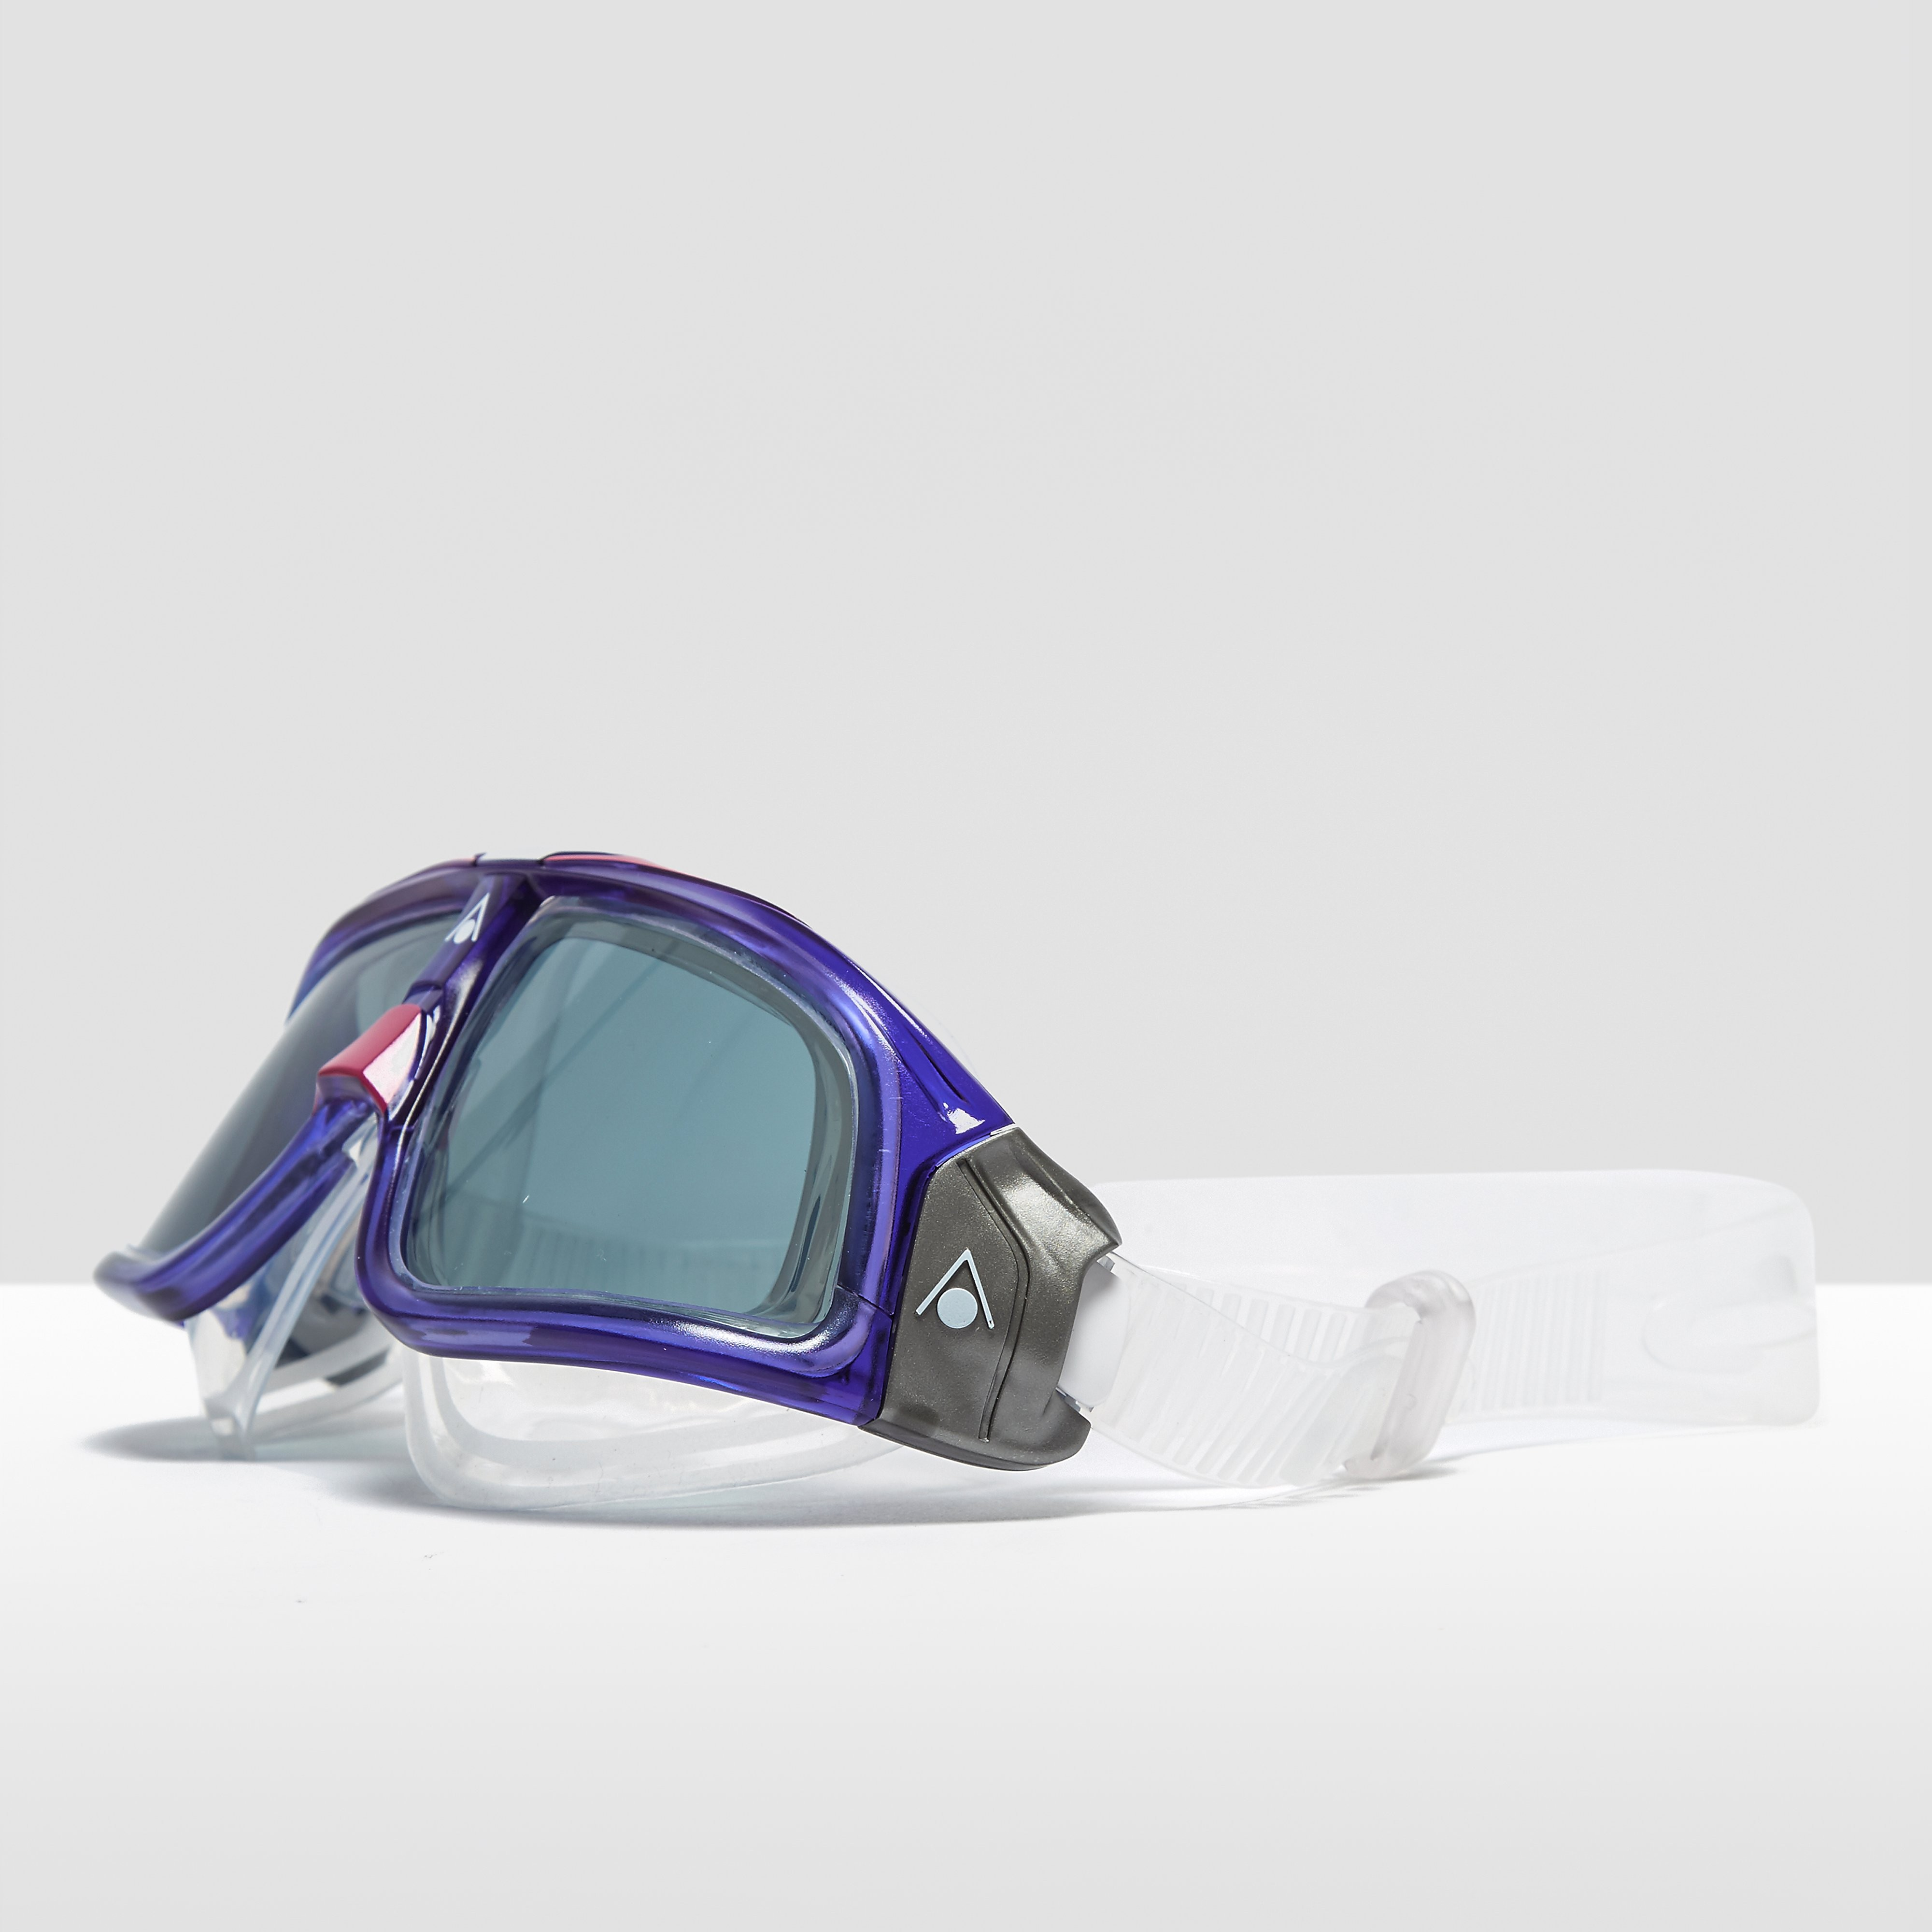 Aqua Sphere Seal 2.0 Ladies Mask